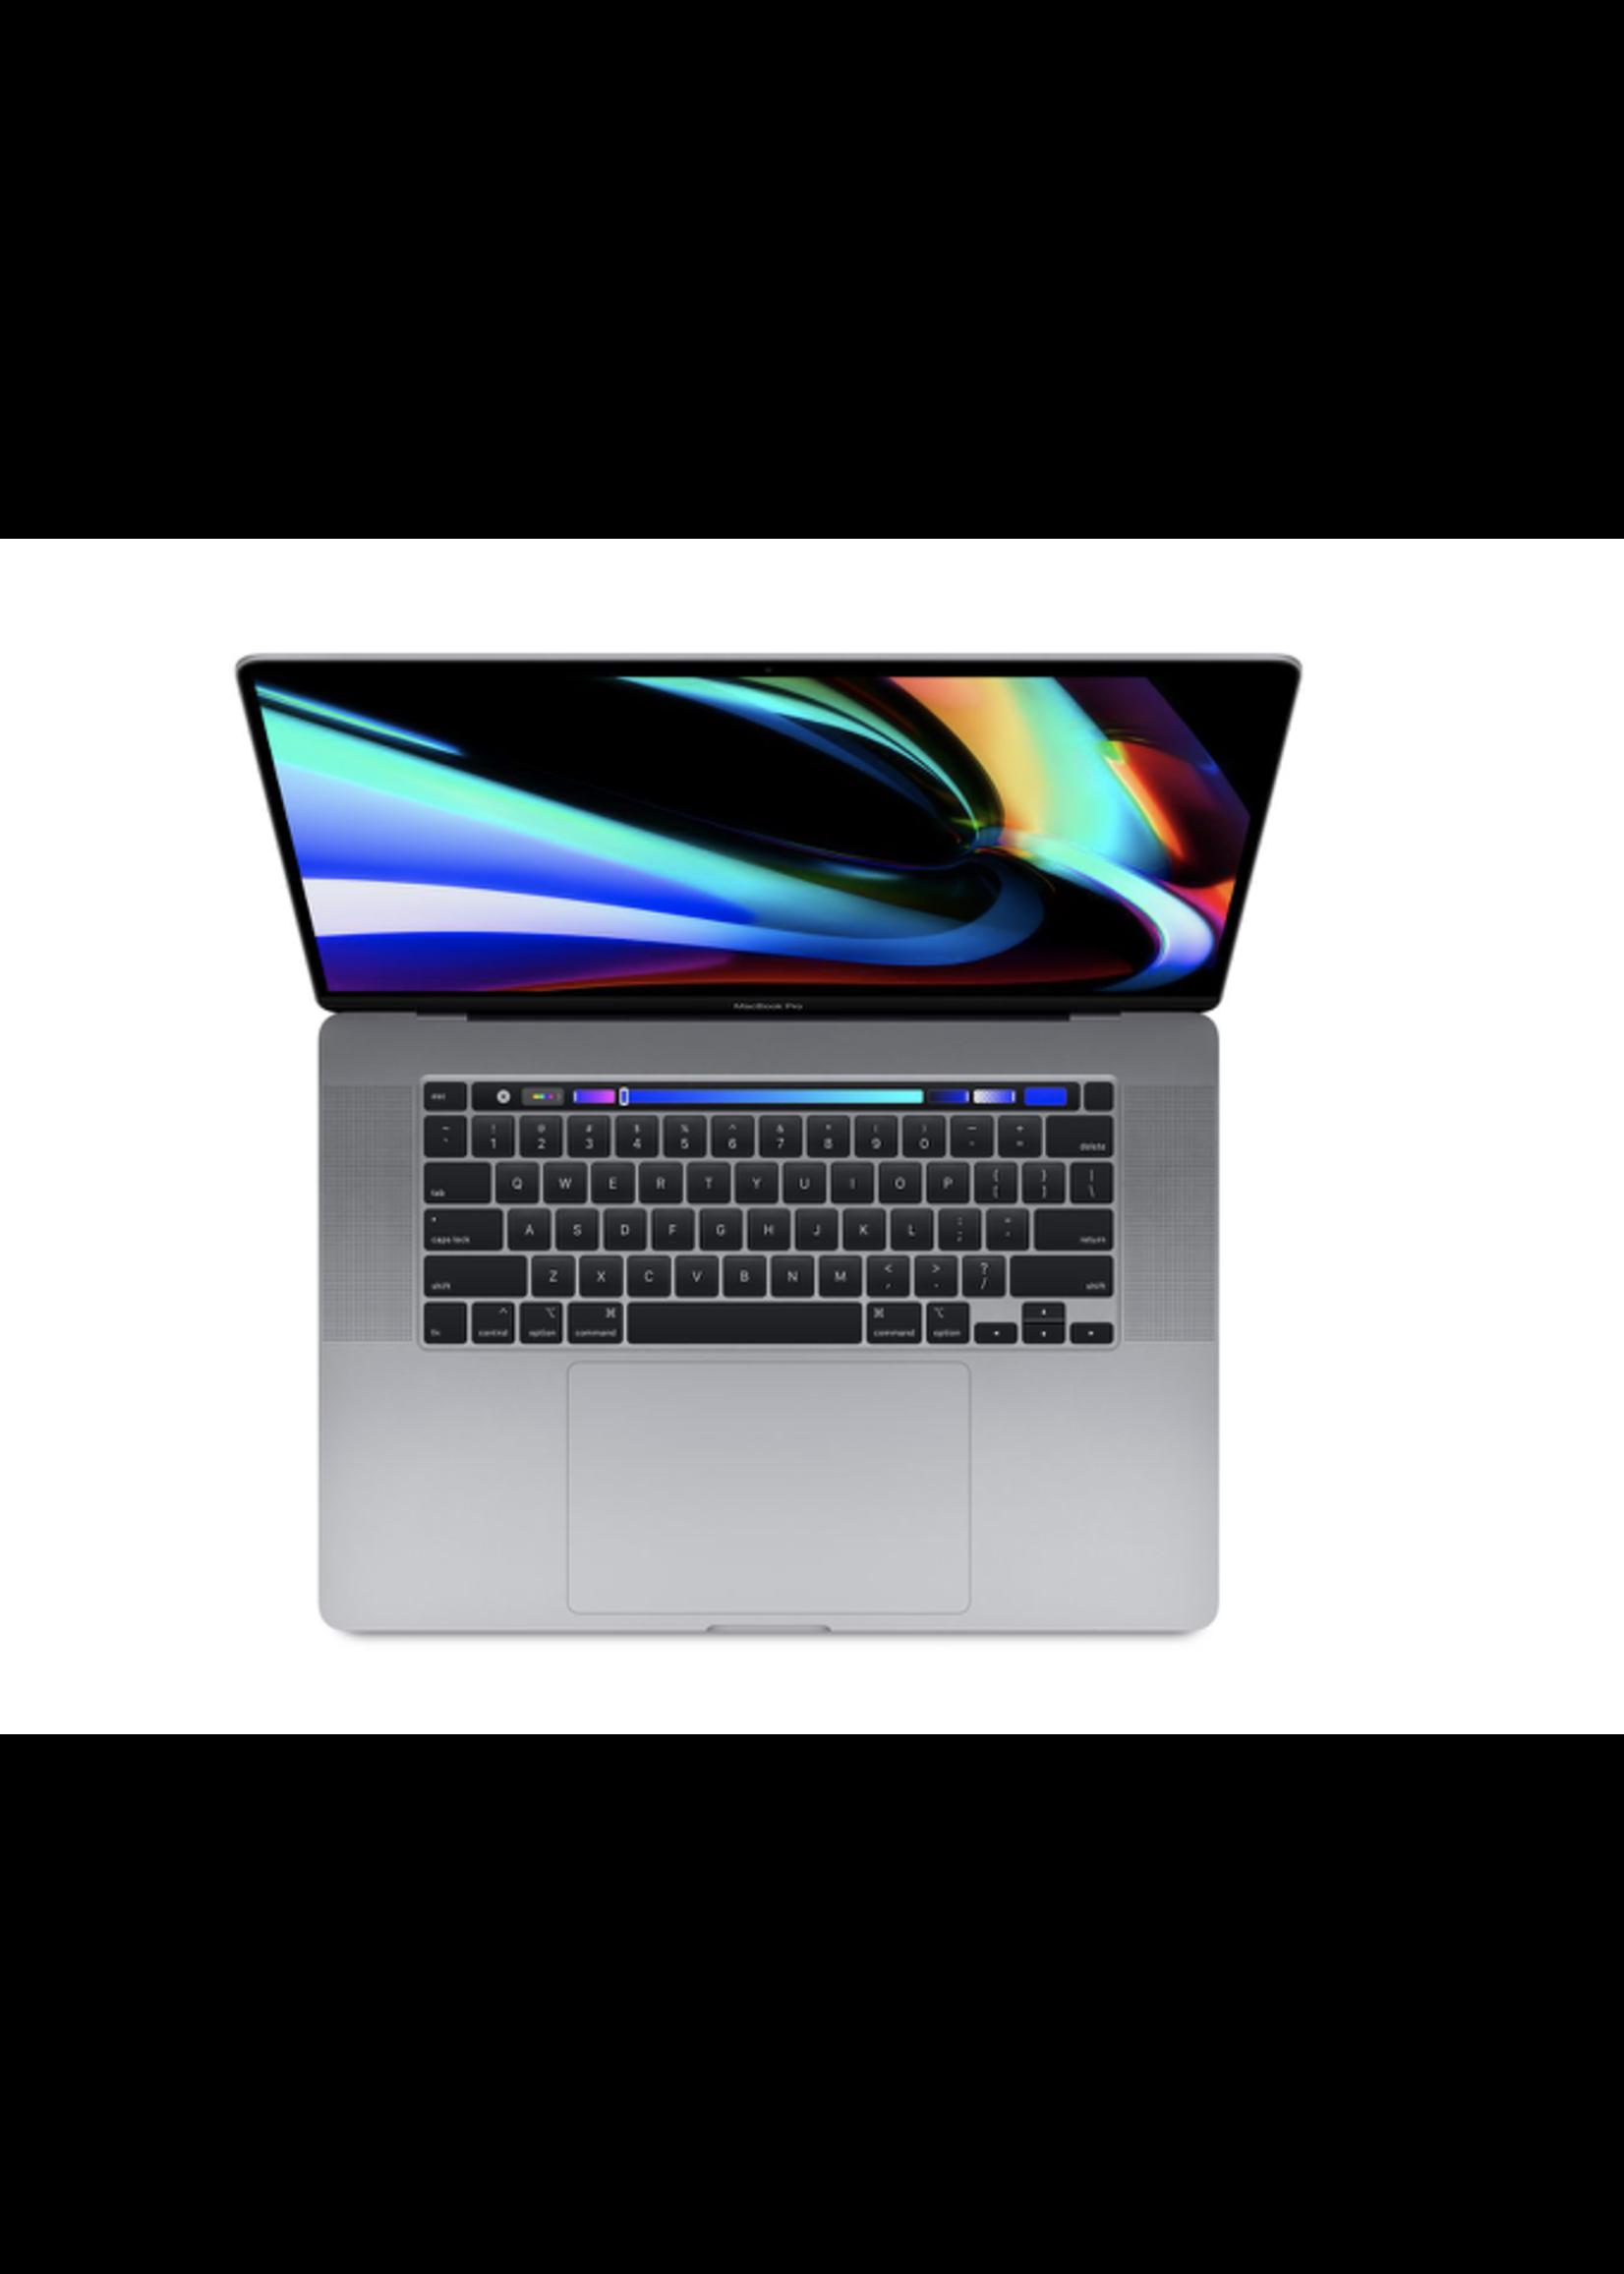 Apple MacBook Pro 16-inch 512GB Space Gray